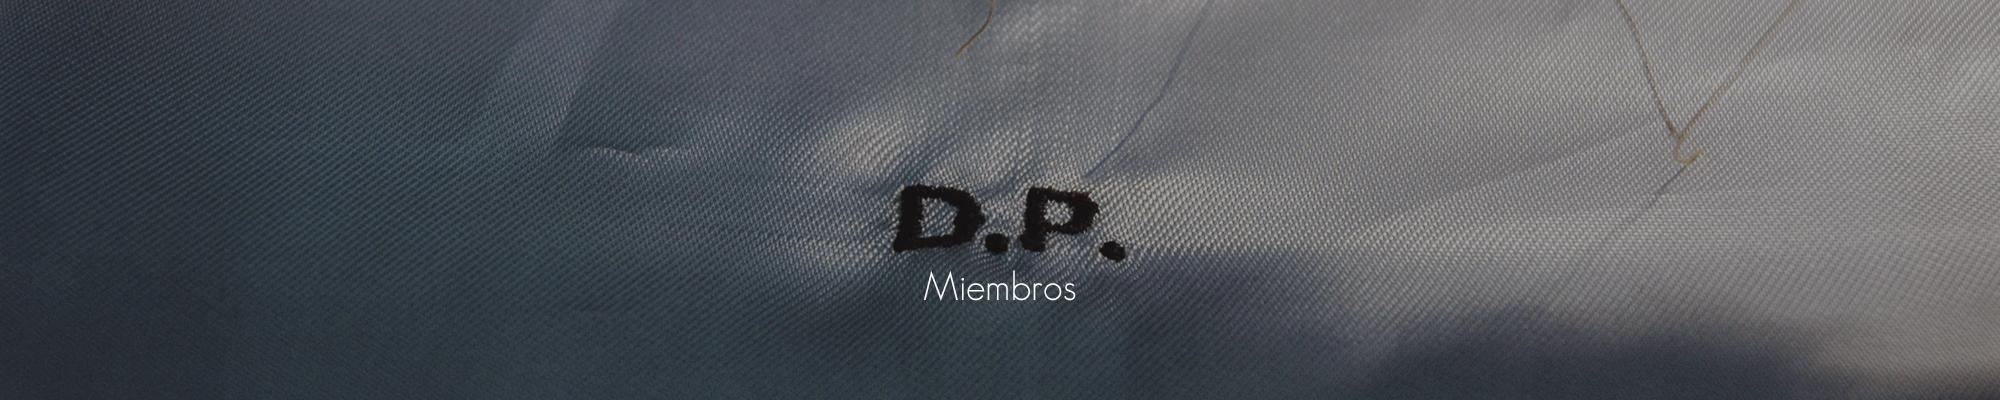 slide-miembros